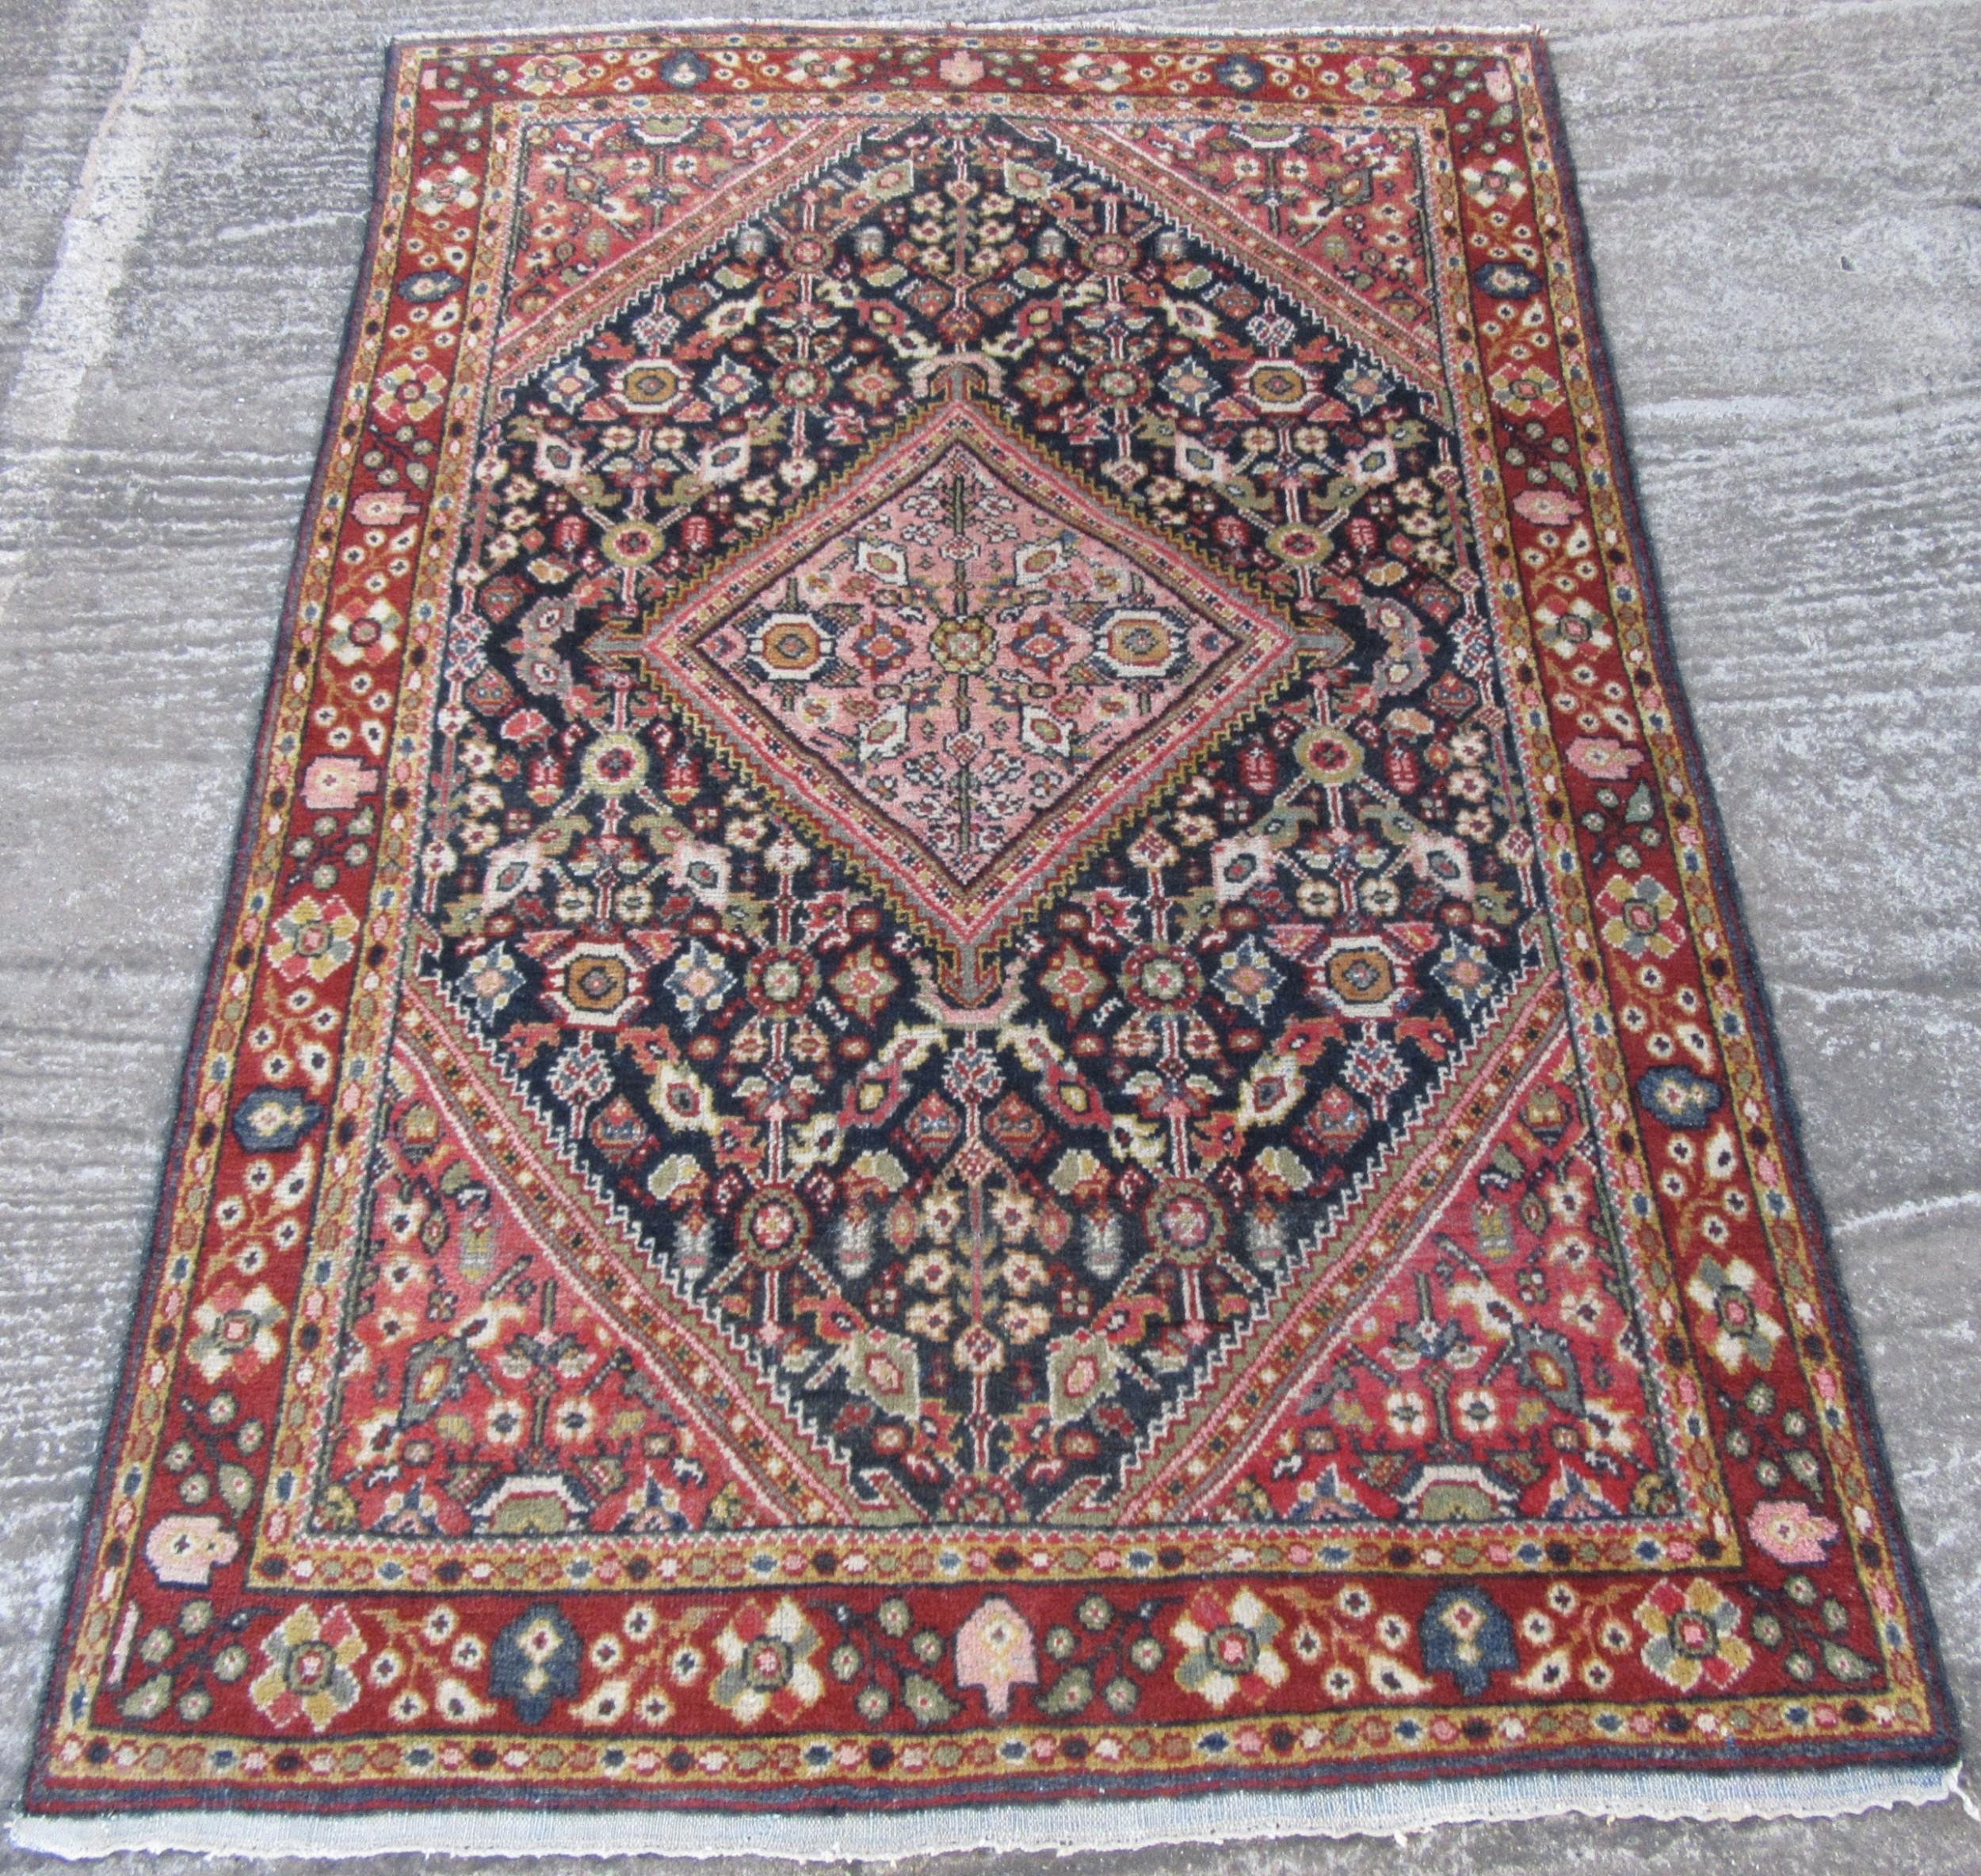 attractive antique north west persian jozan kurdish village rug 10 colours used by settled village kurdish weavers